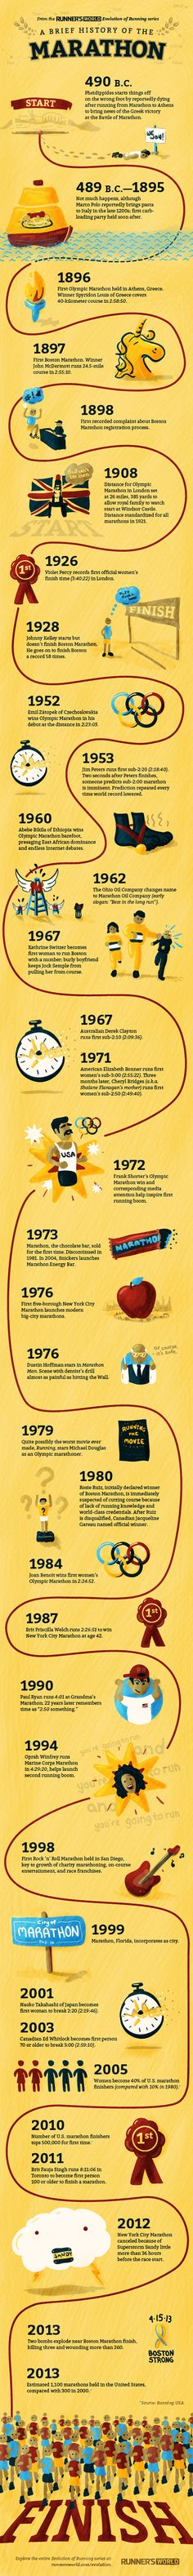 A Brief History of the Marathon | Runner's World